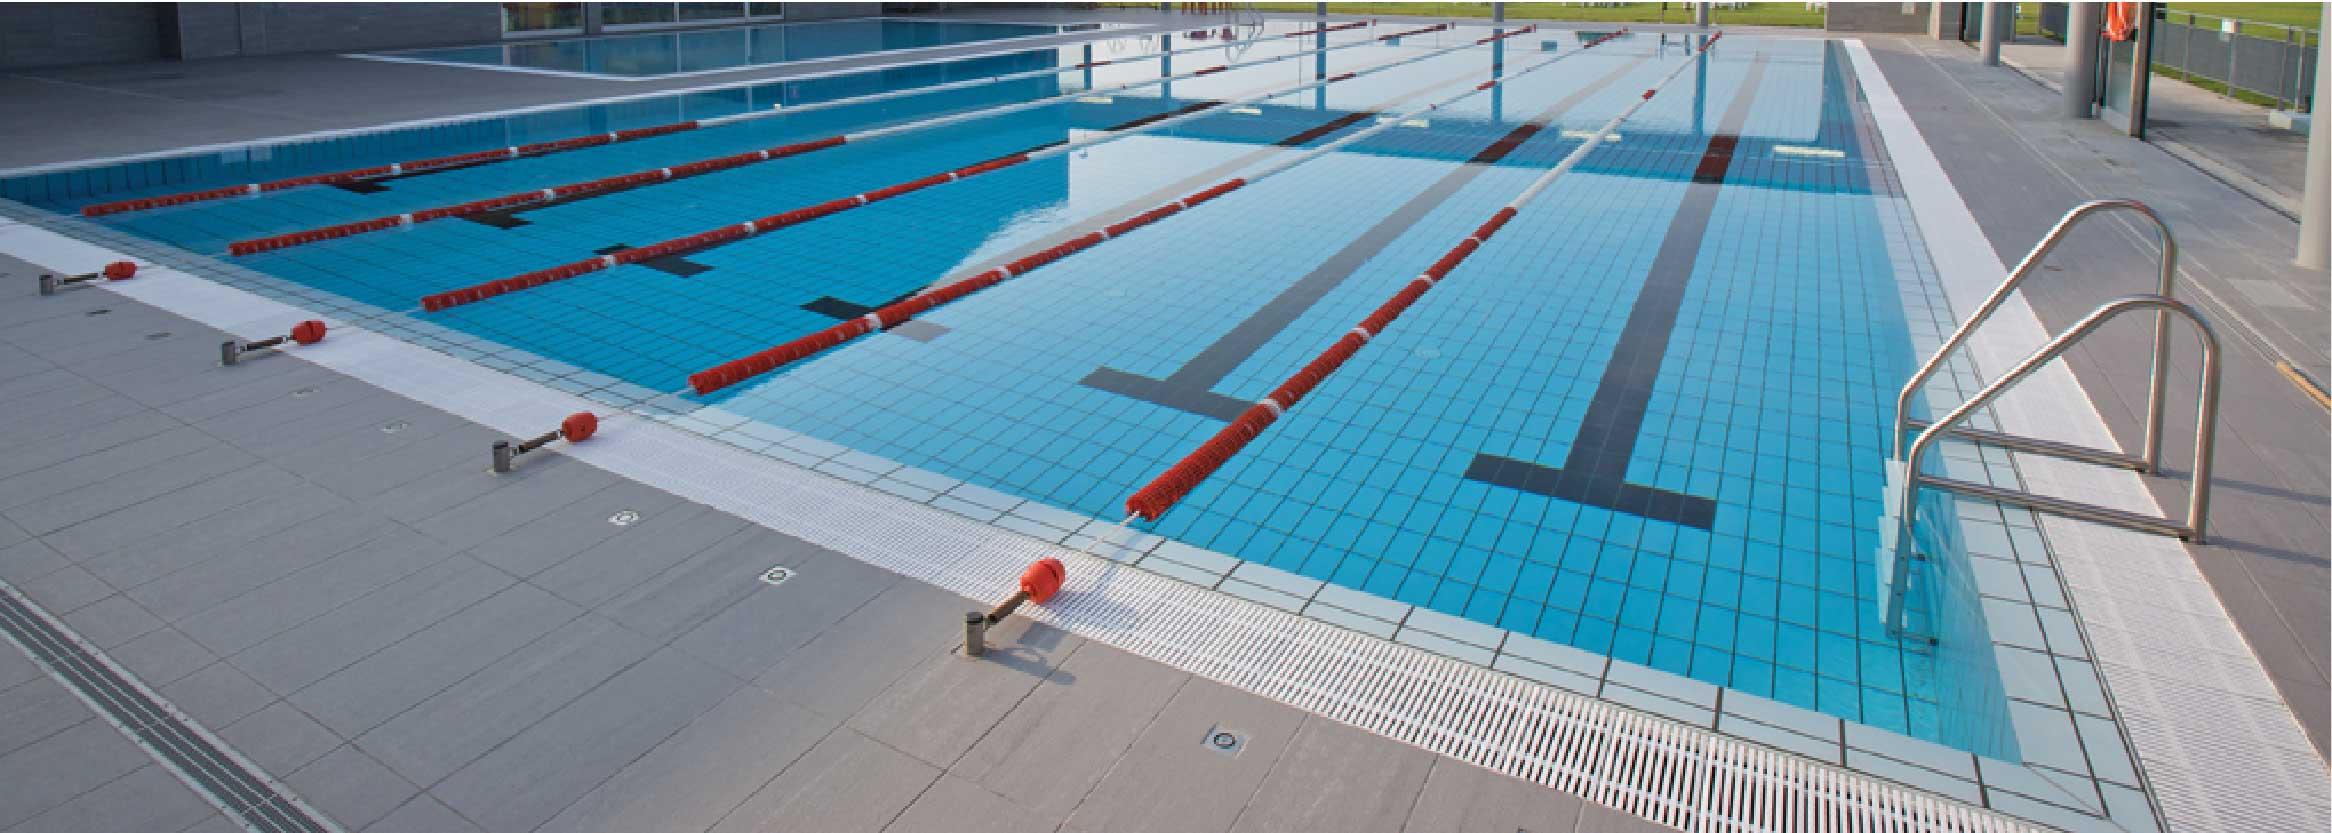 Cermenate home aqvuasport for Piscina limbiate